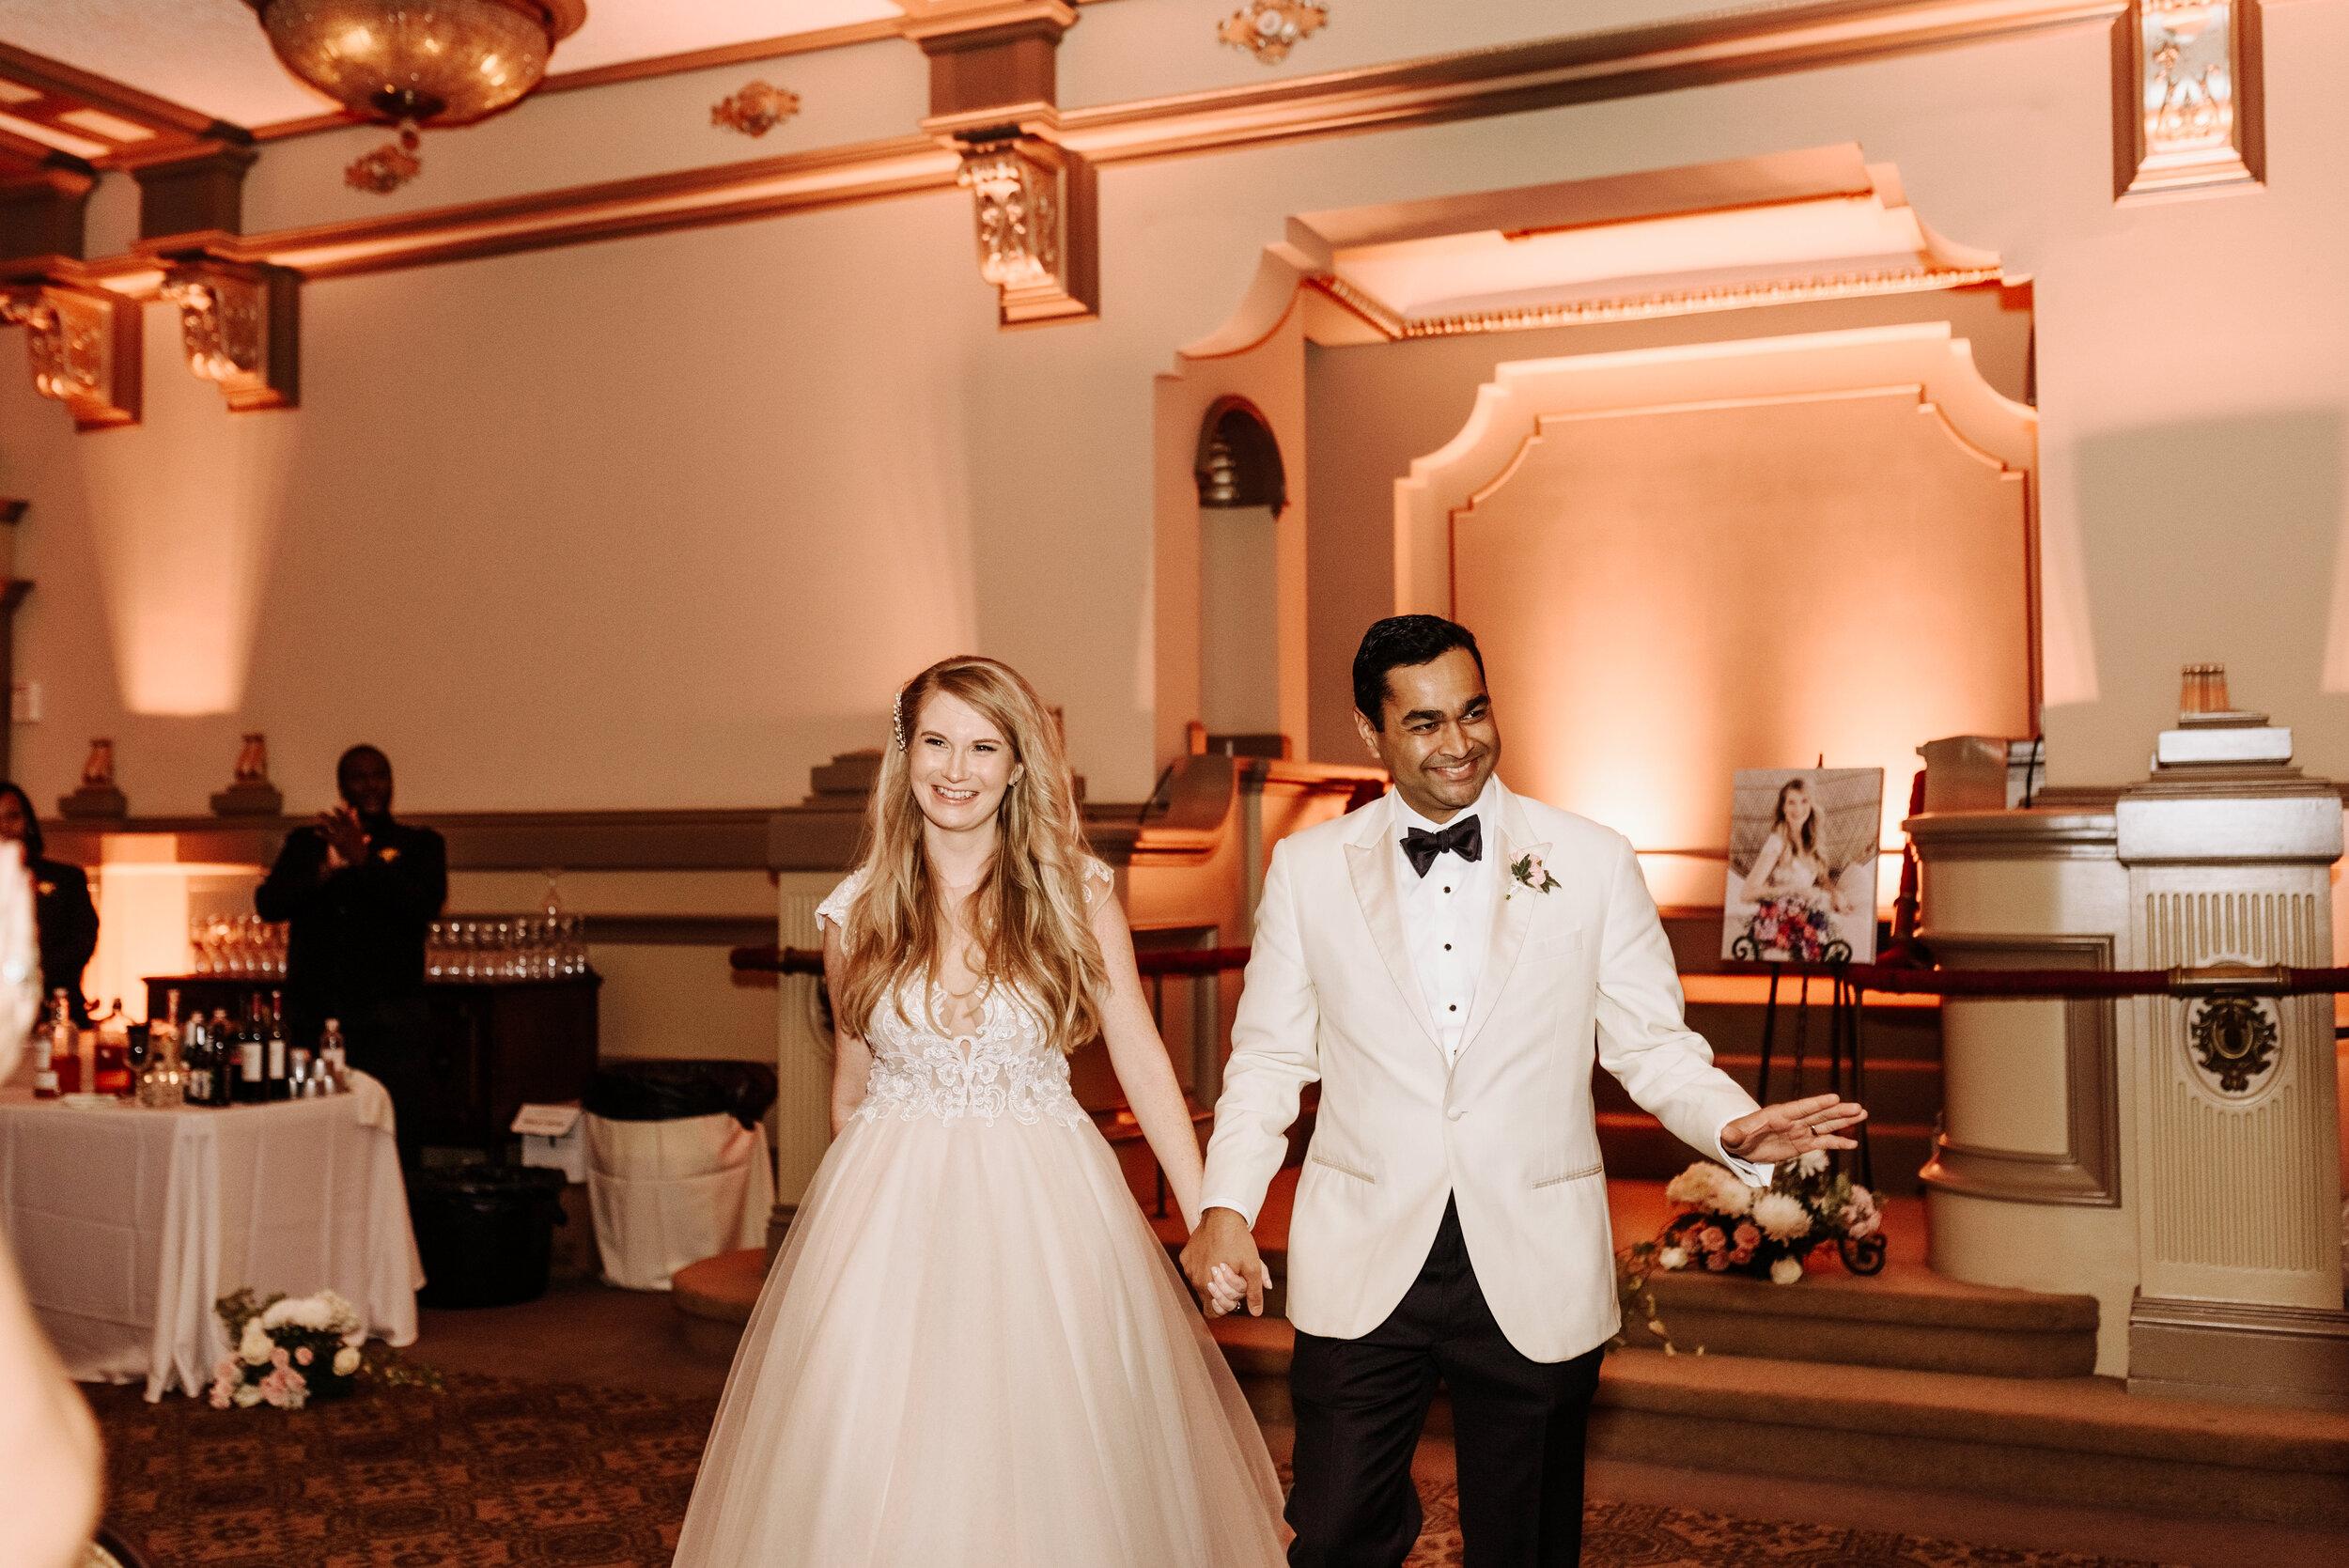 Cassie-Mrunal-Wedding-Quirk-Hotel-John-Marshall-Ballrooms-Richmond-Virginia-Photography-by-V-89.jpg